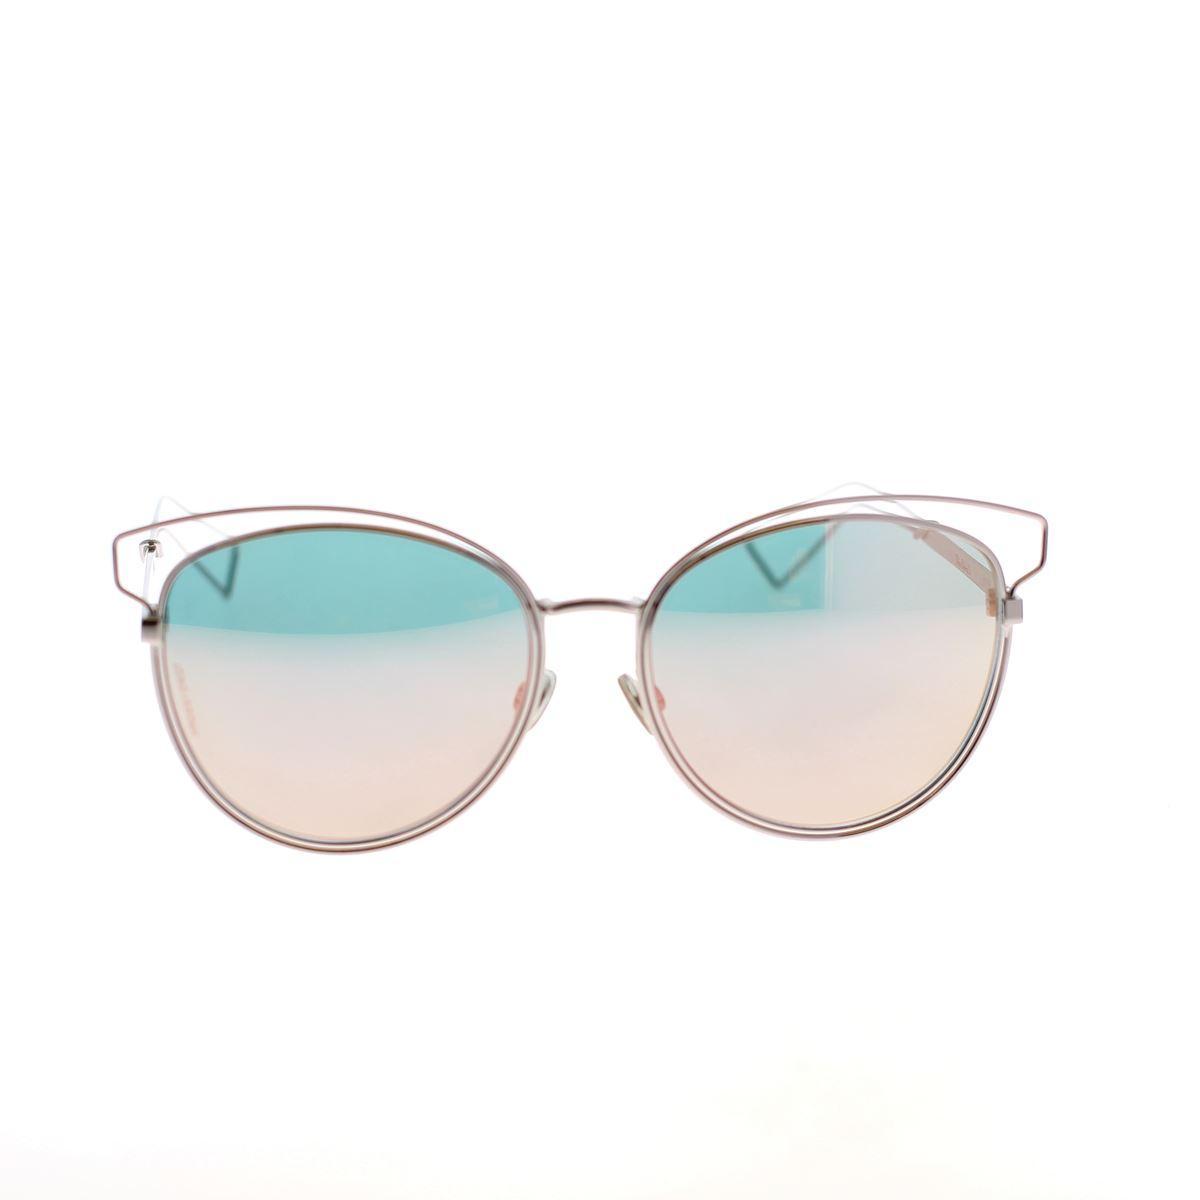 Christian Dior Occhiali da Sole Sideral2 JA0/0J